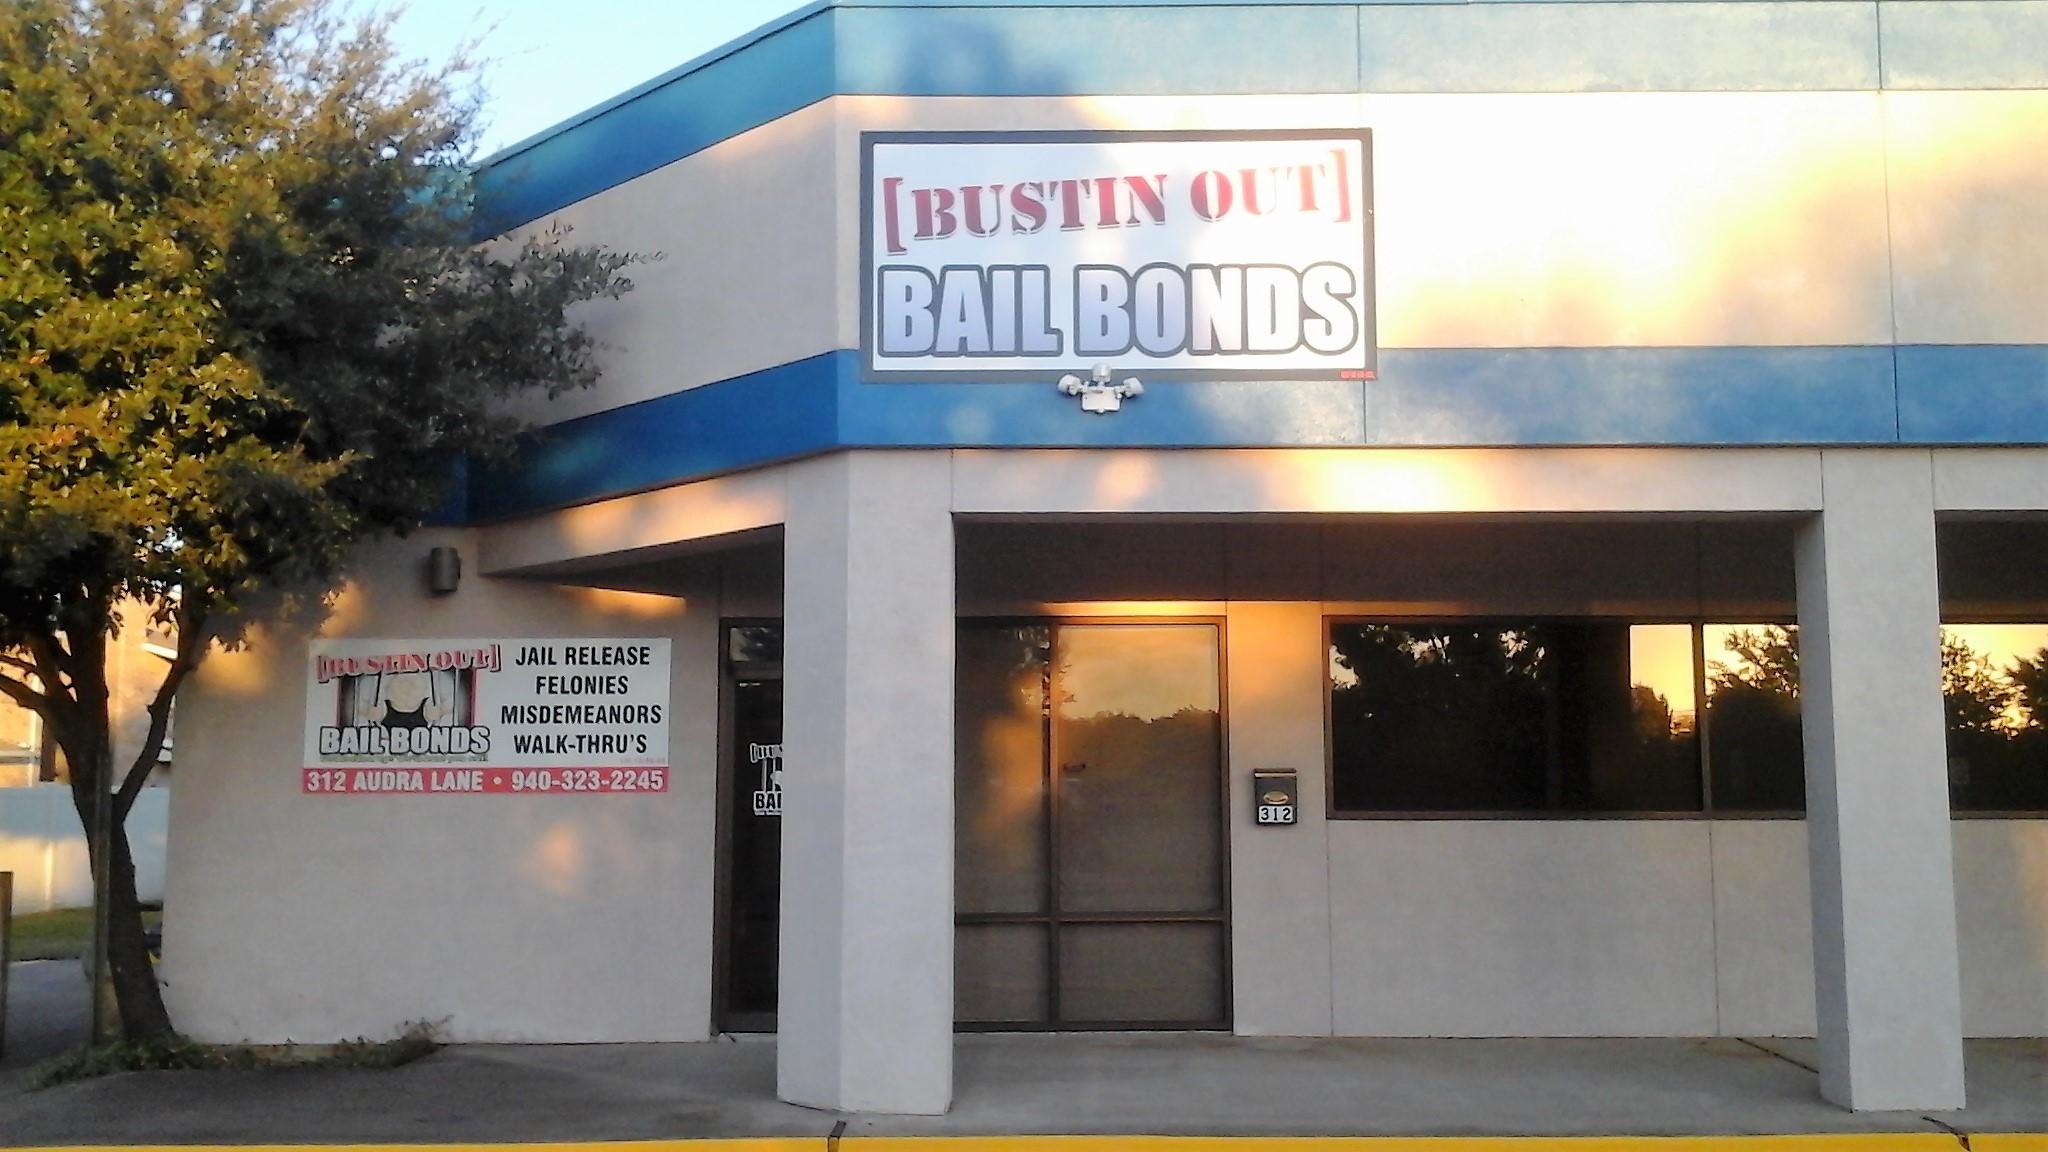 Bustin Out Bail Bonds image 4